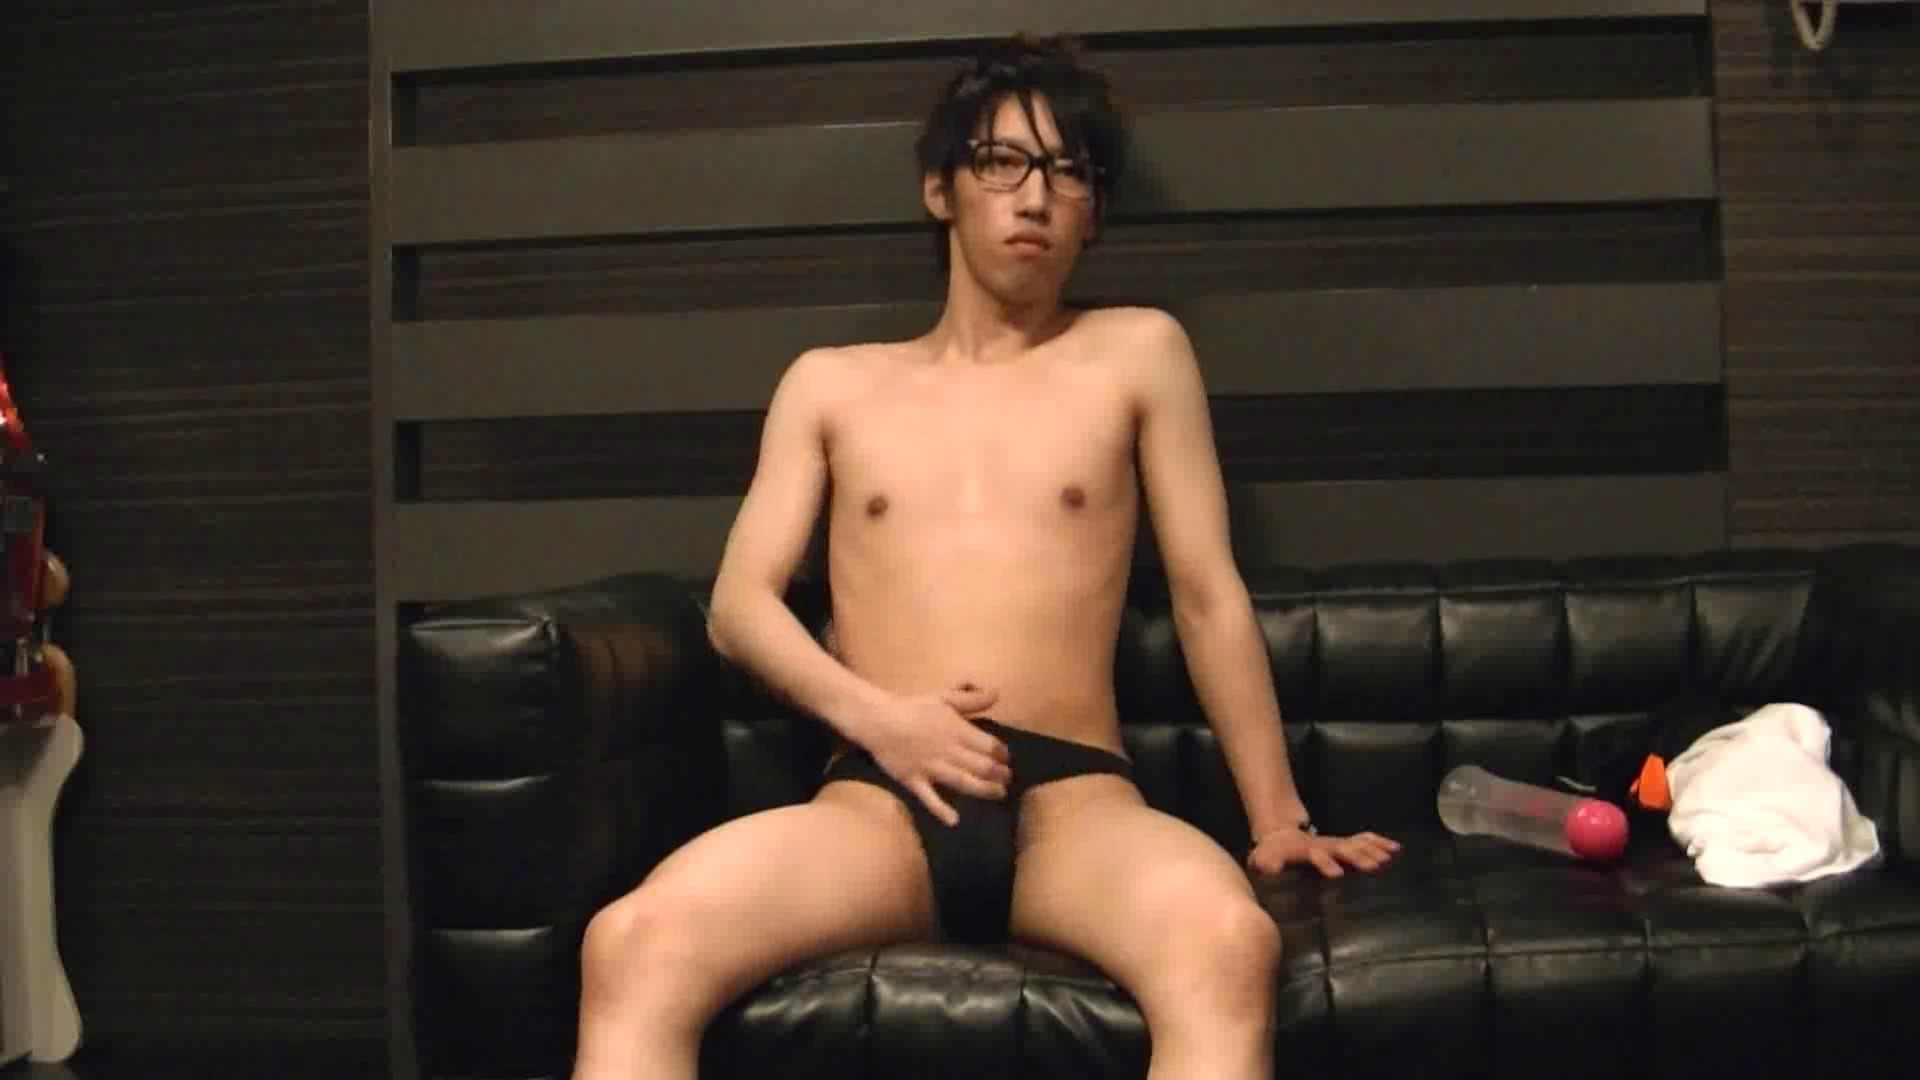 ONA見せカーニバル!! Vol3 男・男 ゲイ無料無修正画像 72pic 18